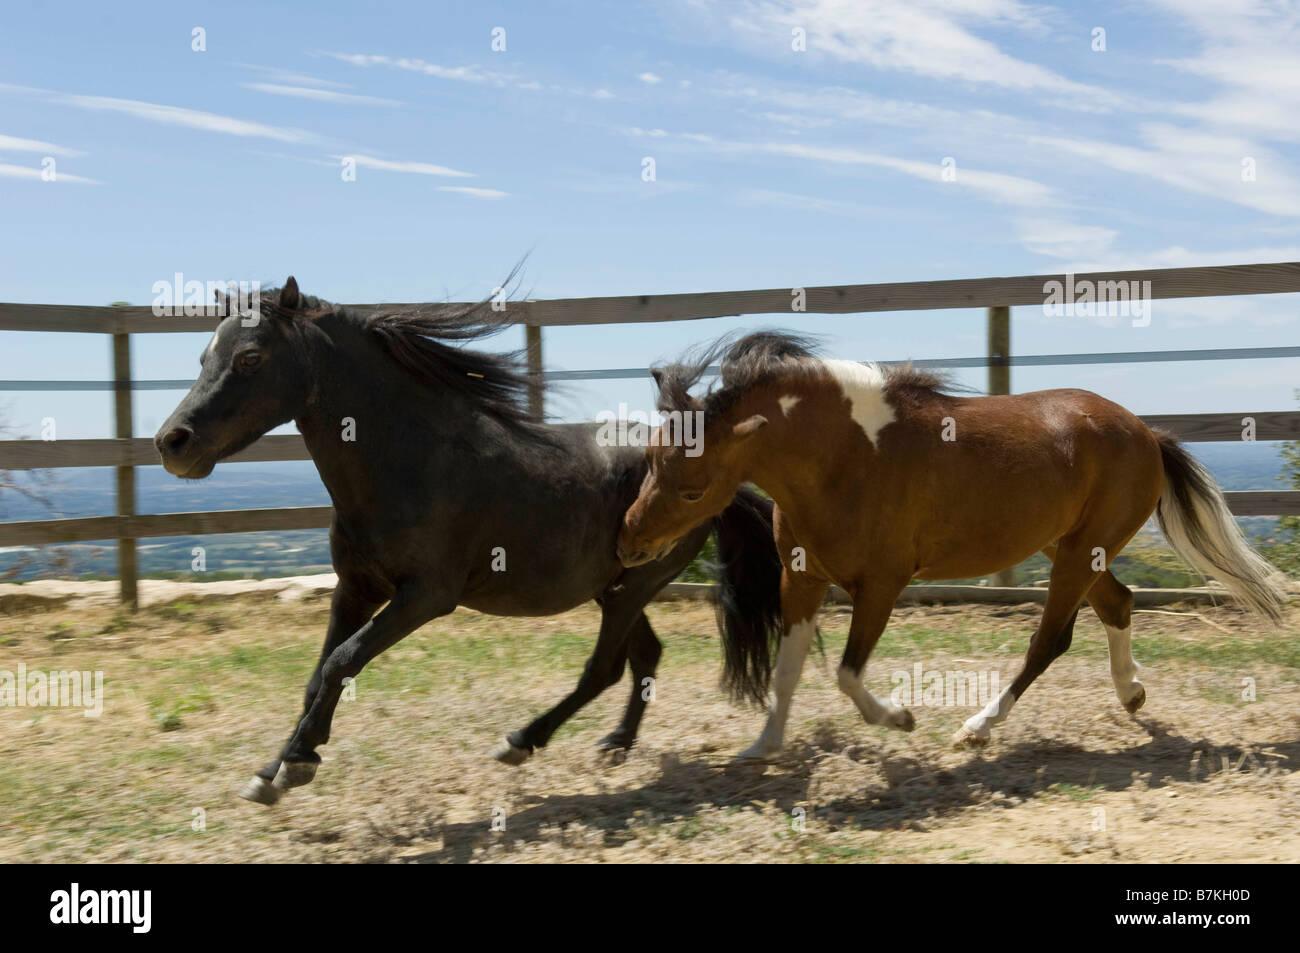 Two miniature horses running - Stock Image